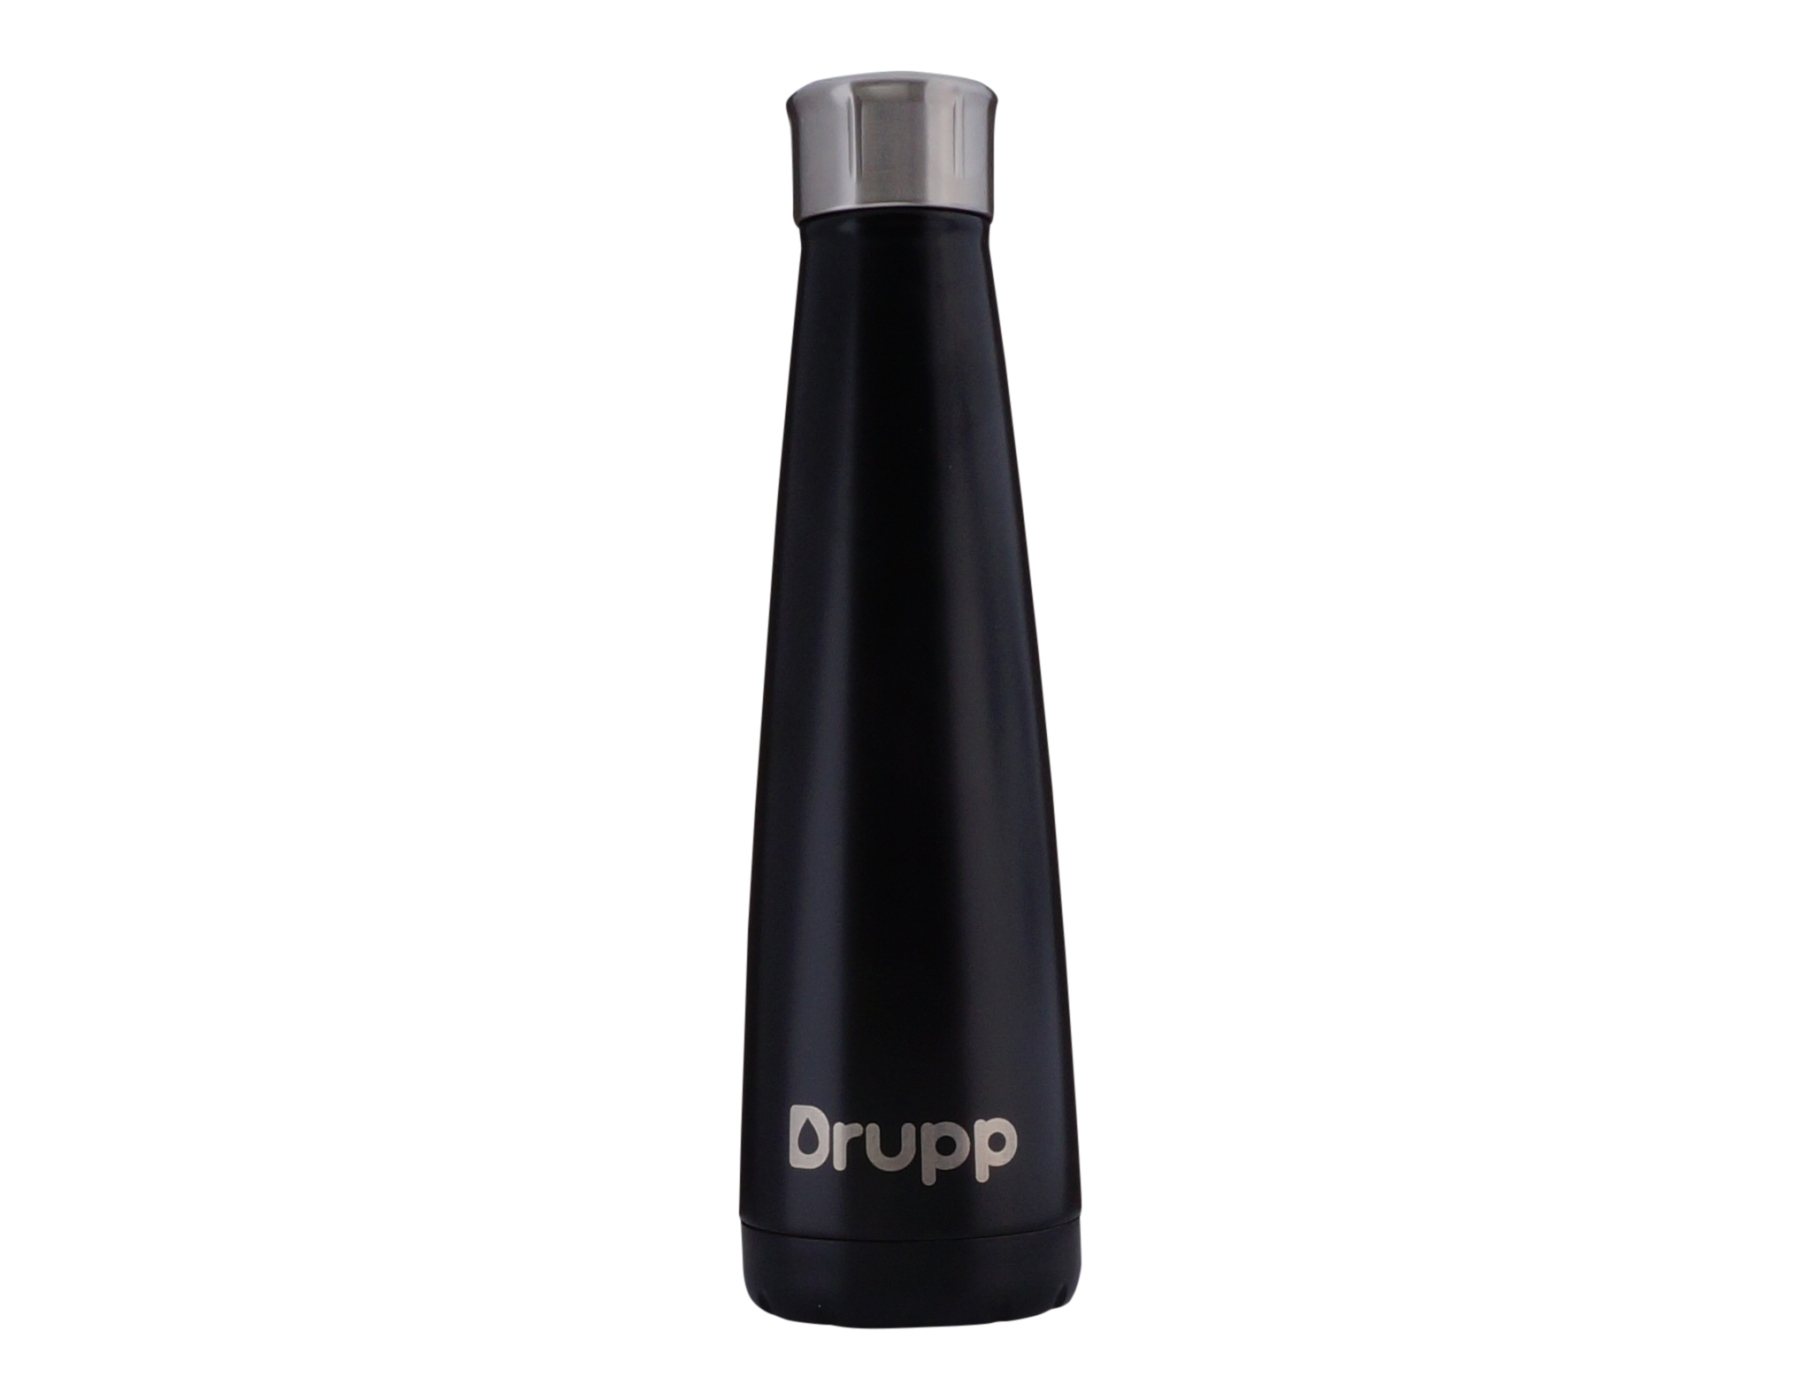 Drupp luxe thermosfles zwart